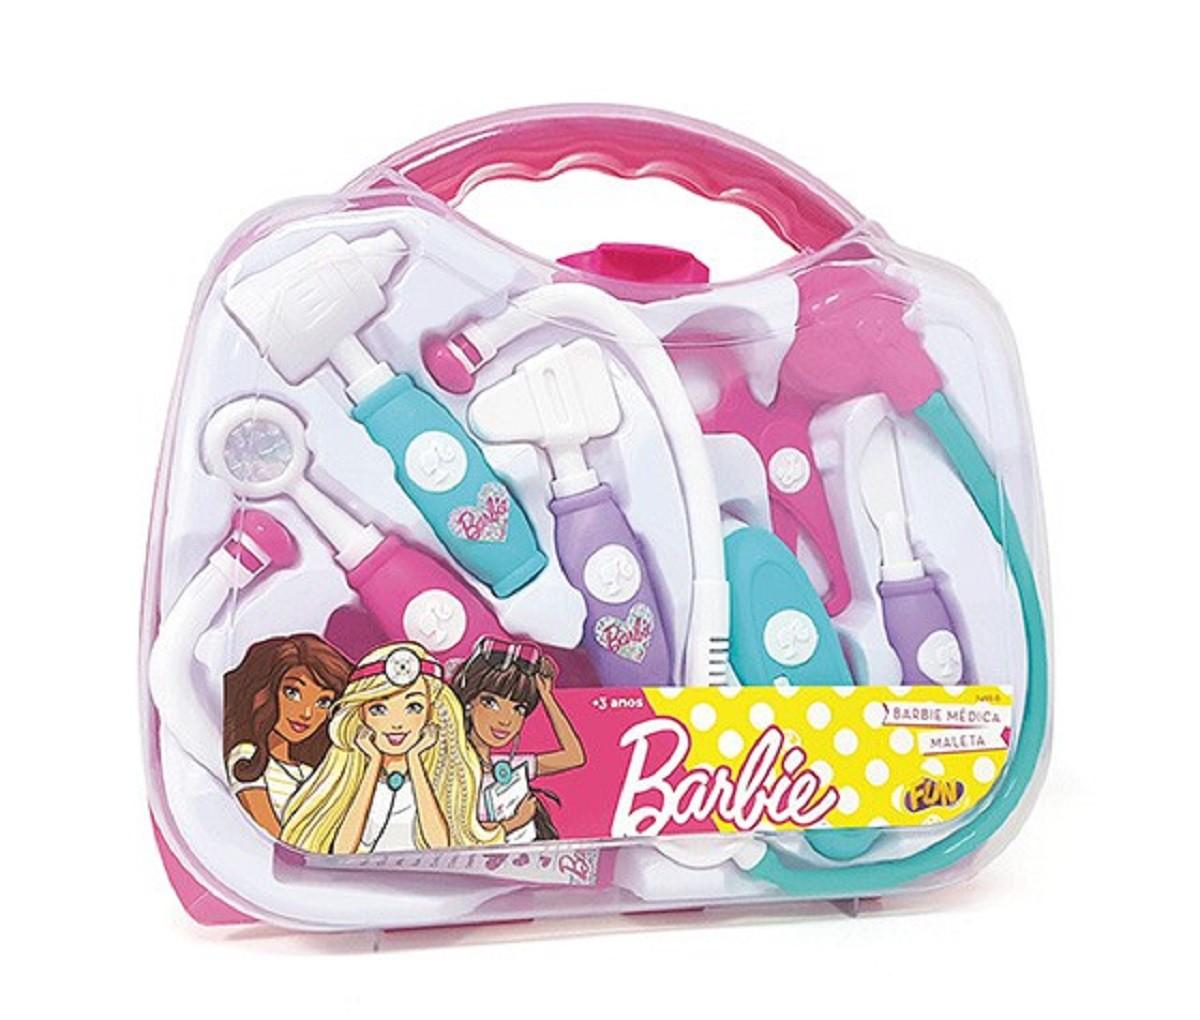 Brinquedo Kit Maleta Médica Barbie 8 Peças Fun Toys